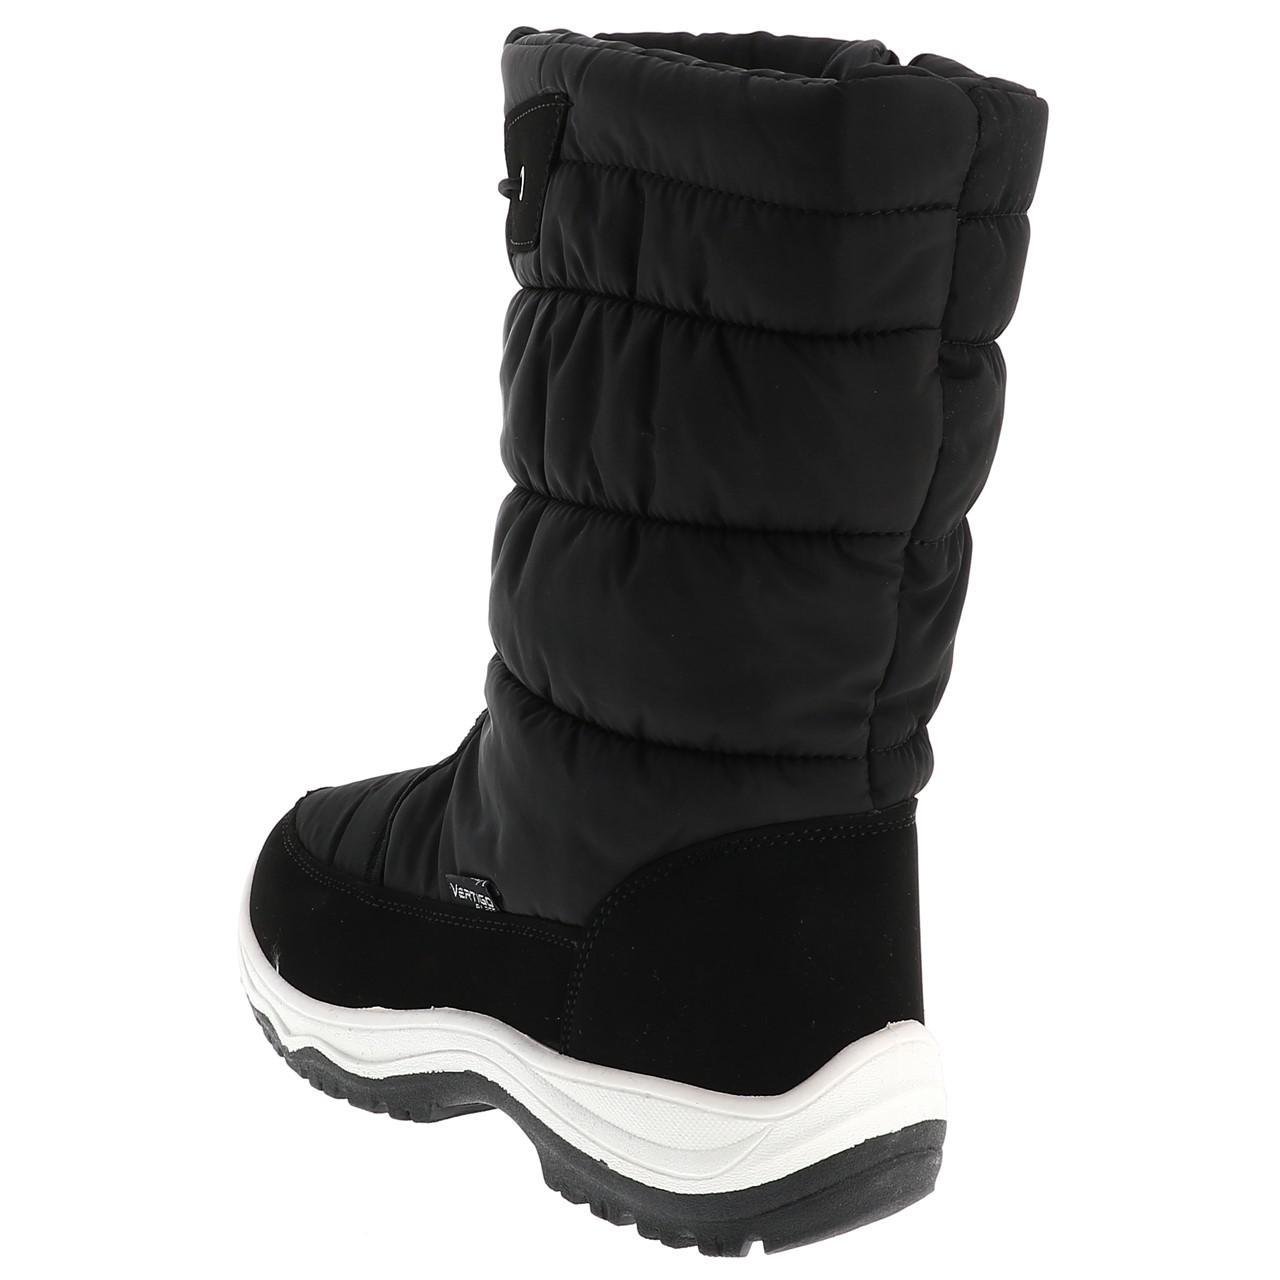 Bottes-neige-apres-ski-Alpes-vertigo-Listo-noir-boots-l-Noir-14439-Neuf miniature 3